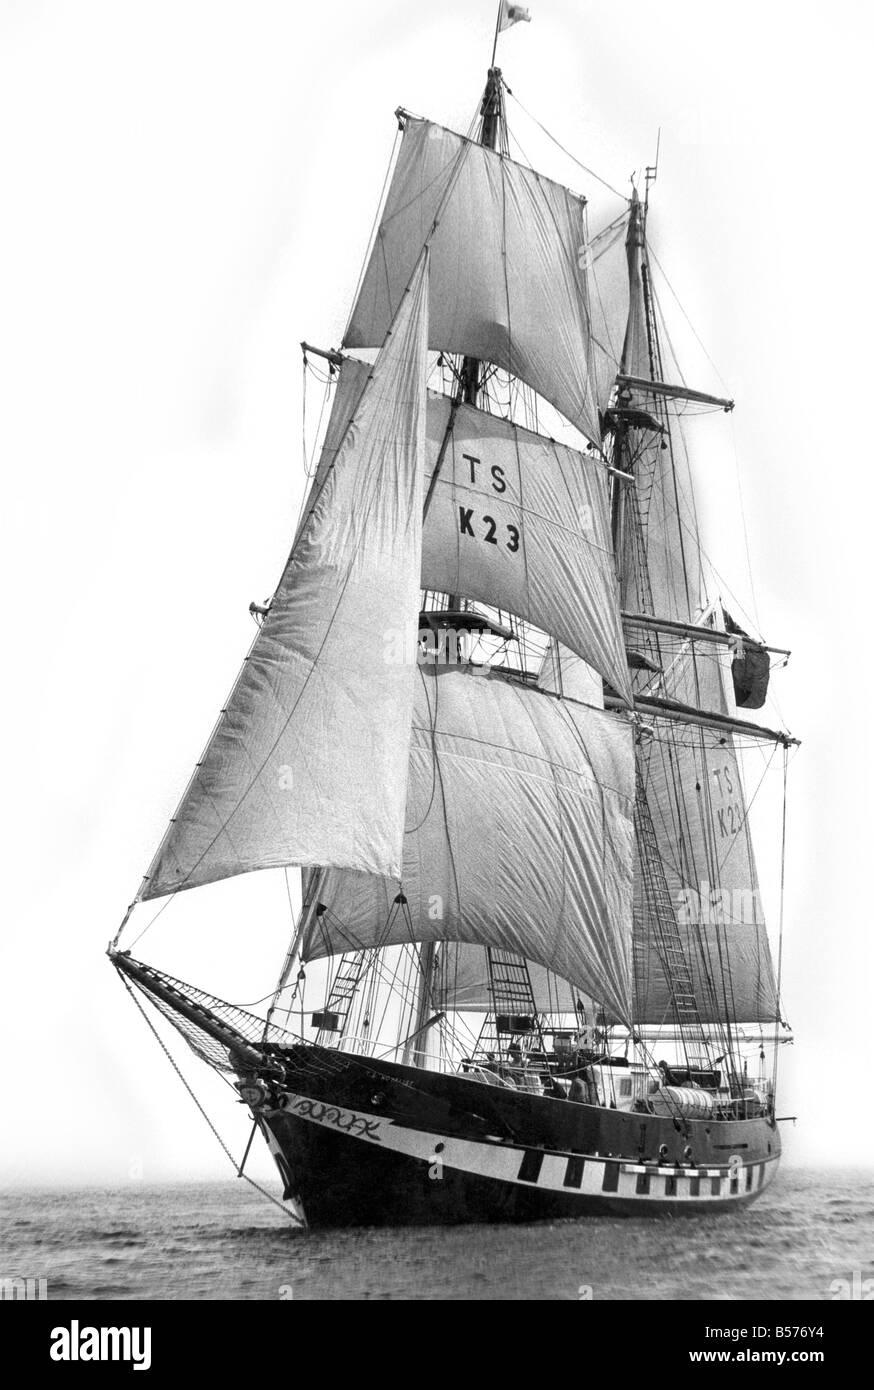 Sail training Ship Royalist. March 1976 P005224 - Stock Image